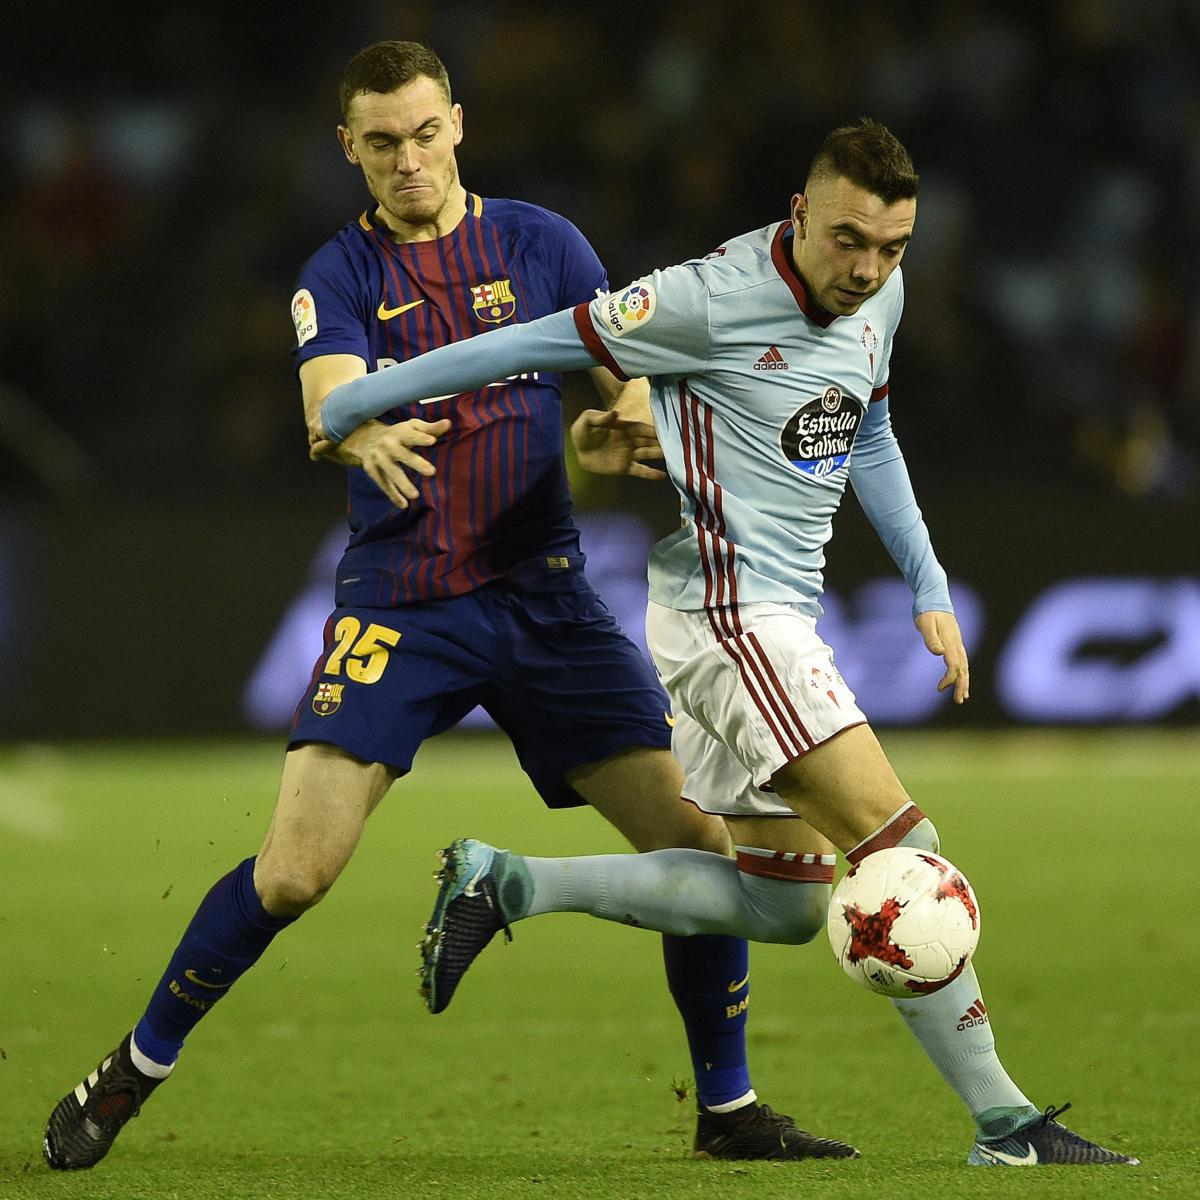 Celta Vigo Hold Barcelona To 1-1 Draw In Copa Del Rey